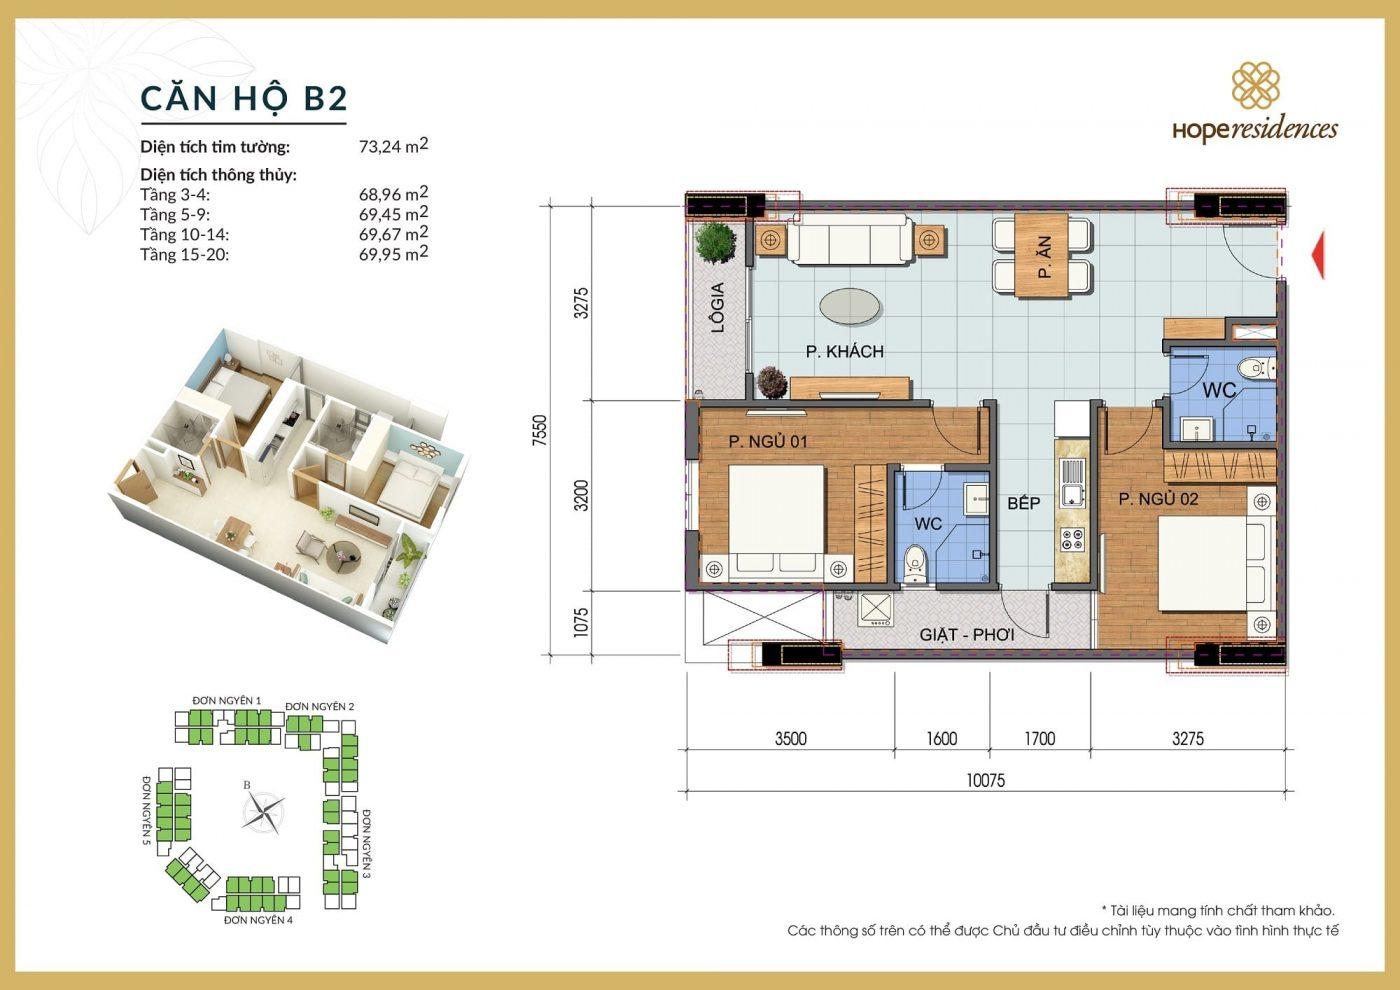 mat bang thiet ke can ho b2 hope residences